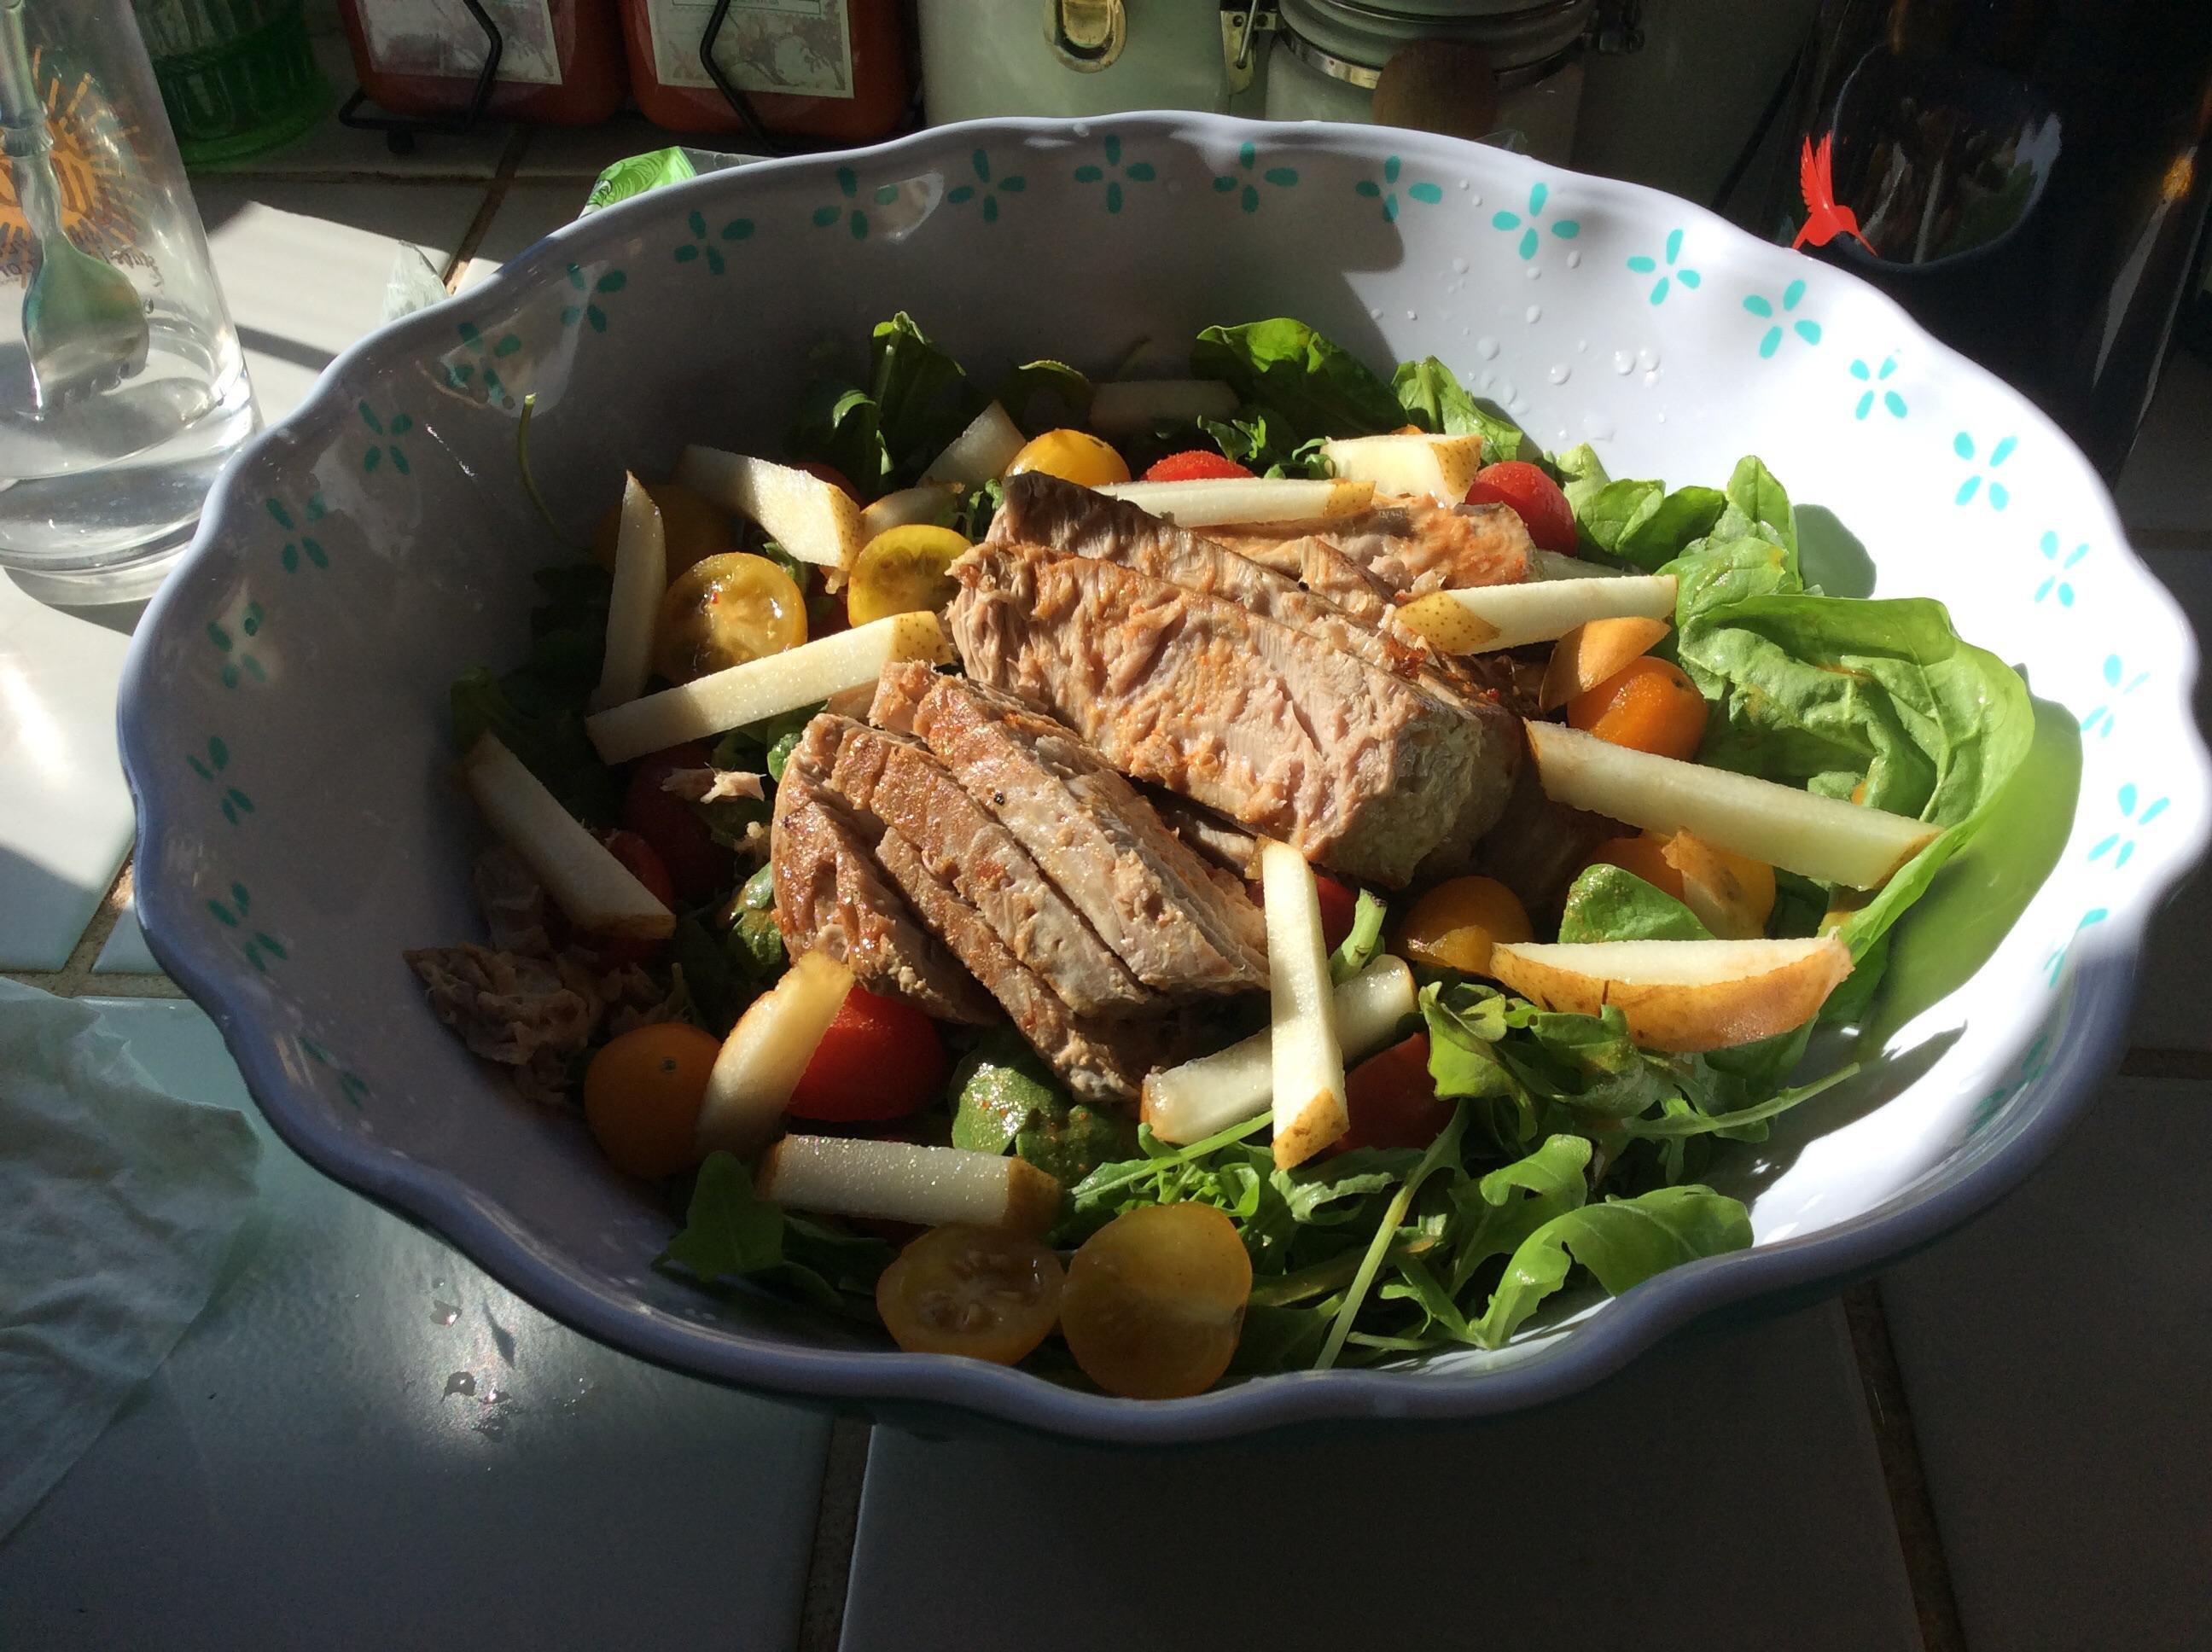 Seared Ahi Tuna with Watercress, Chile, and Ginger Salad